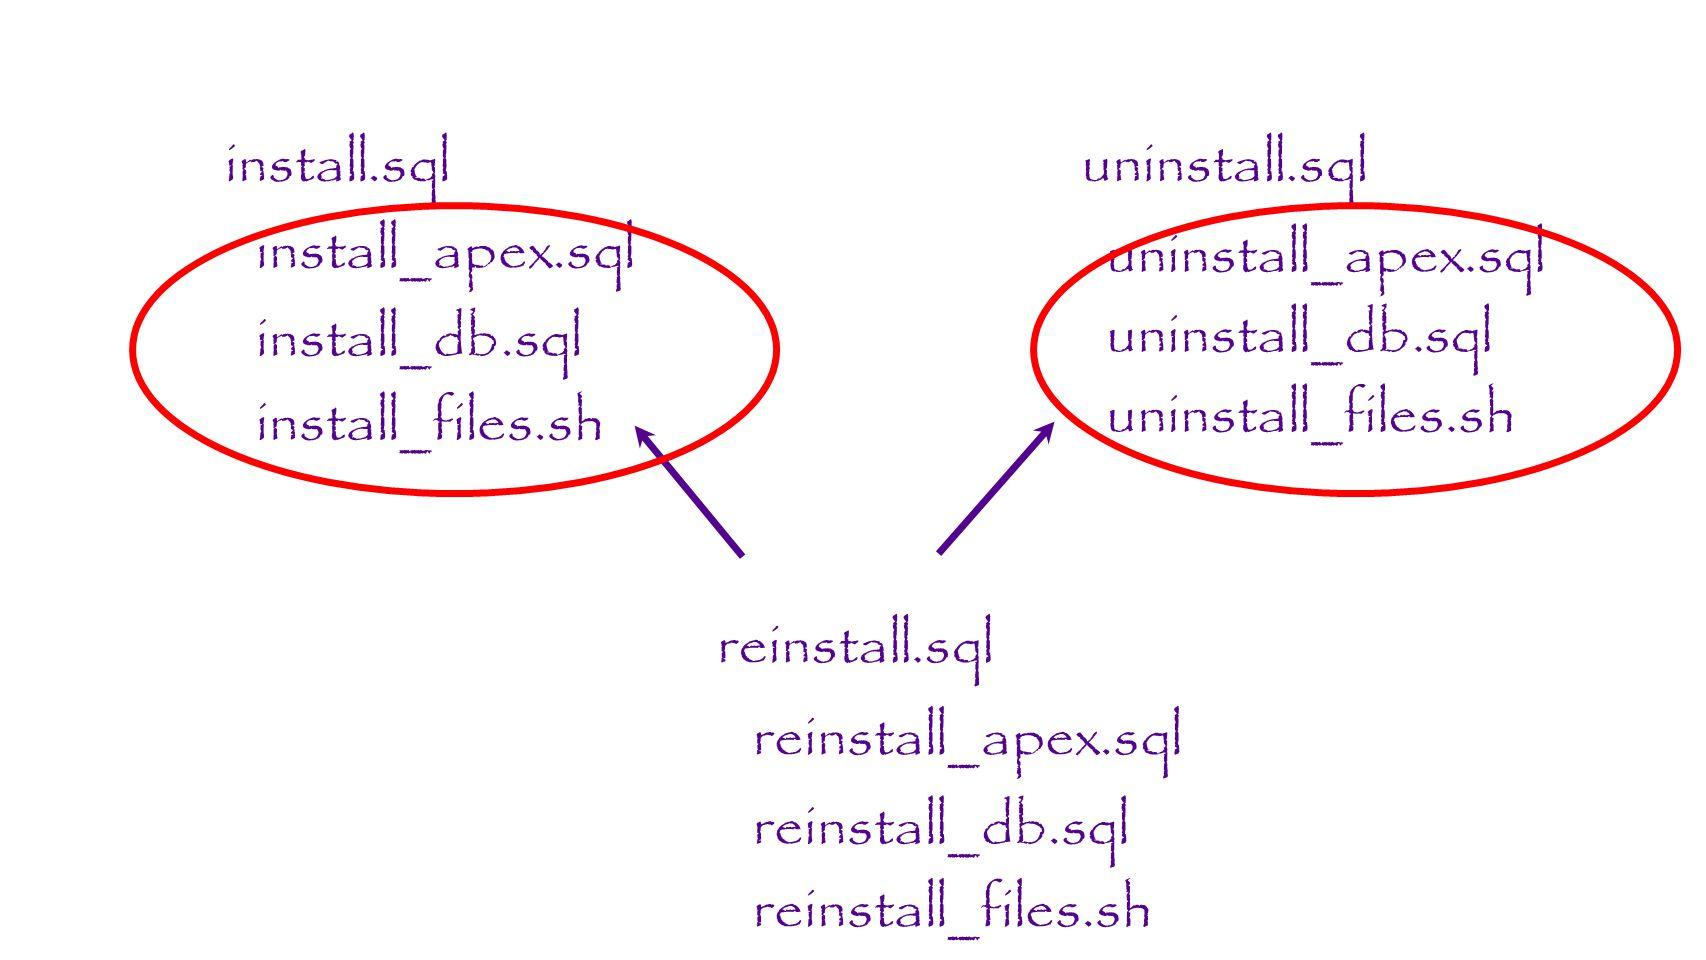 install.sqluninstall.sql reinstall.sql install_apex.sql install_db.sql uninstall_db.sql uninstall_apex.sql reinstall_apex.sql reinstall_db.sql install_files.sh uninstall_files.sh reinstall_files.sh